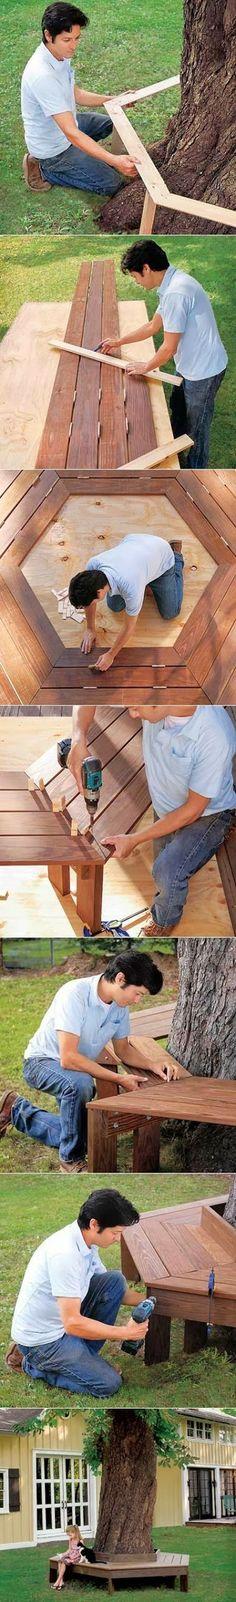 Diy : How to build a bench around a tree   DIY & Crafts Tutorials